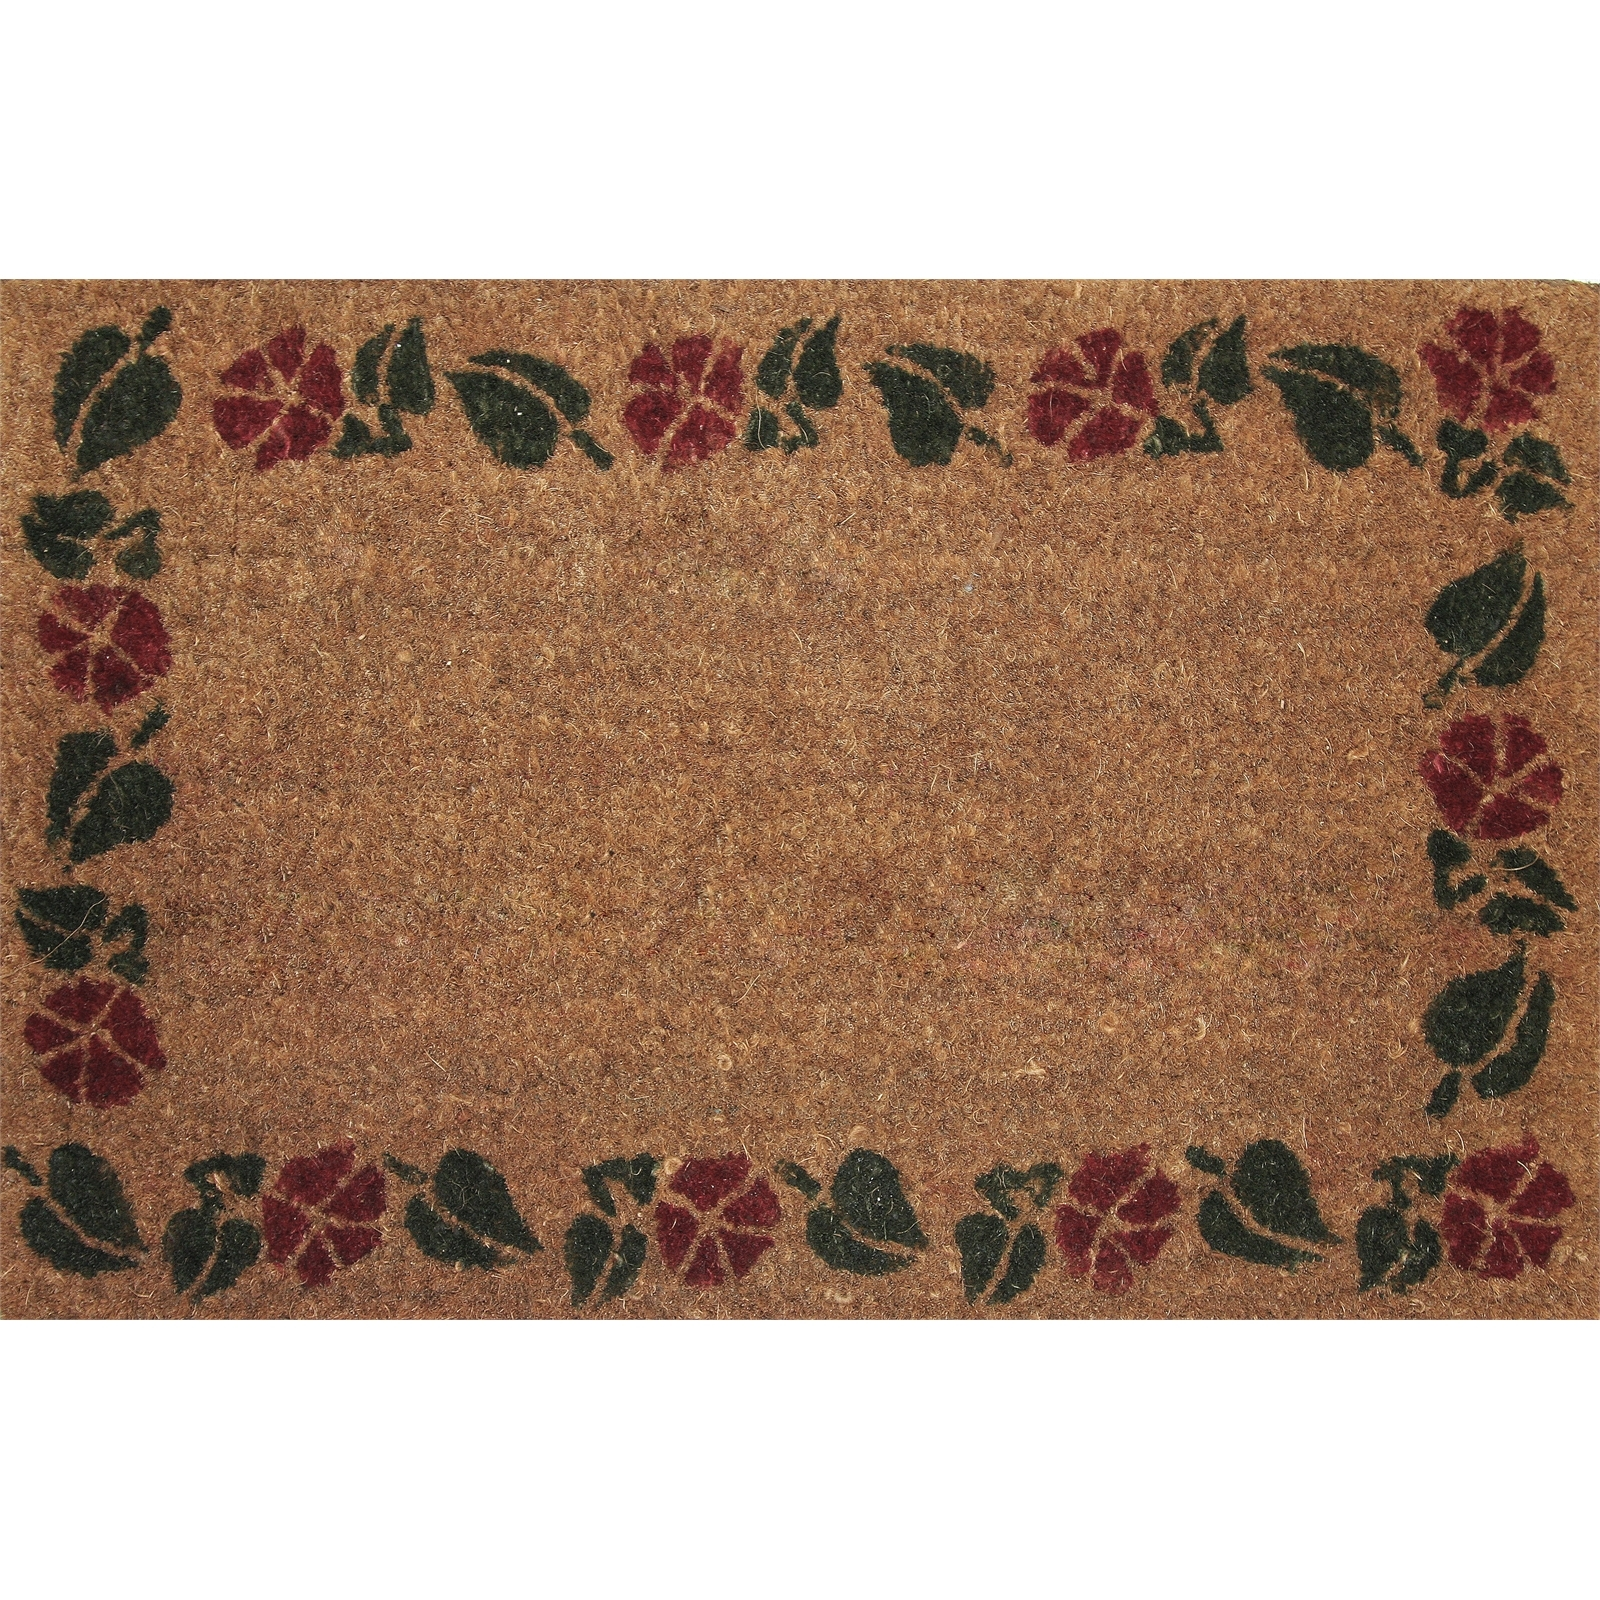 Bayliss 45 x 70cm Natural SPC Gift Outdoor Mat